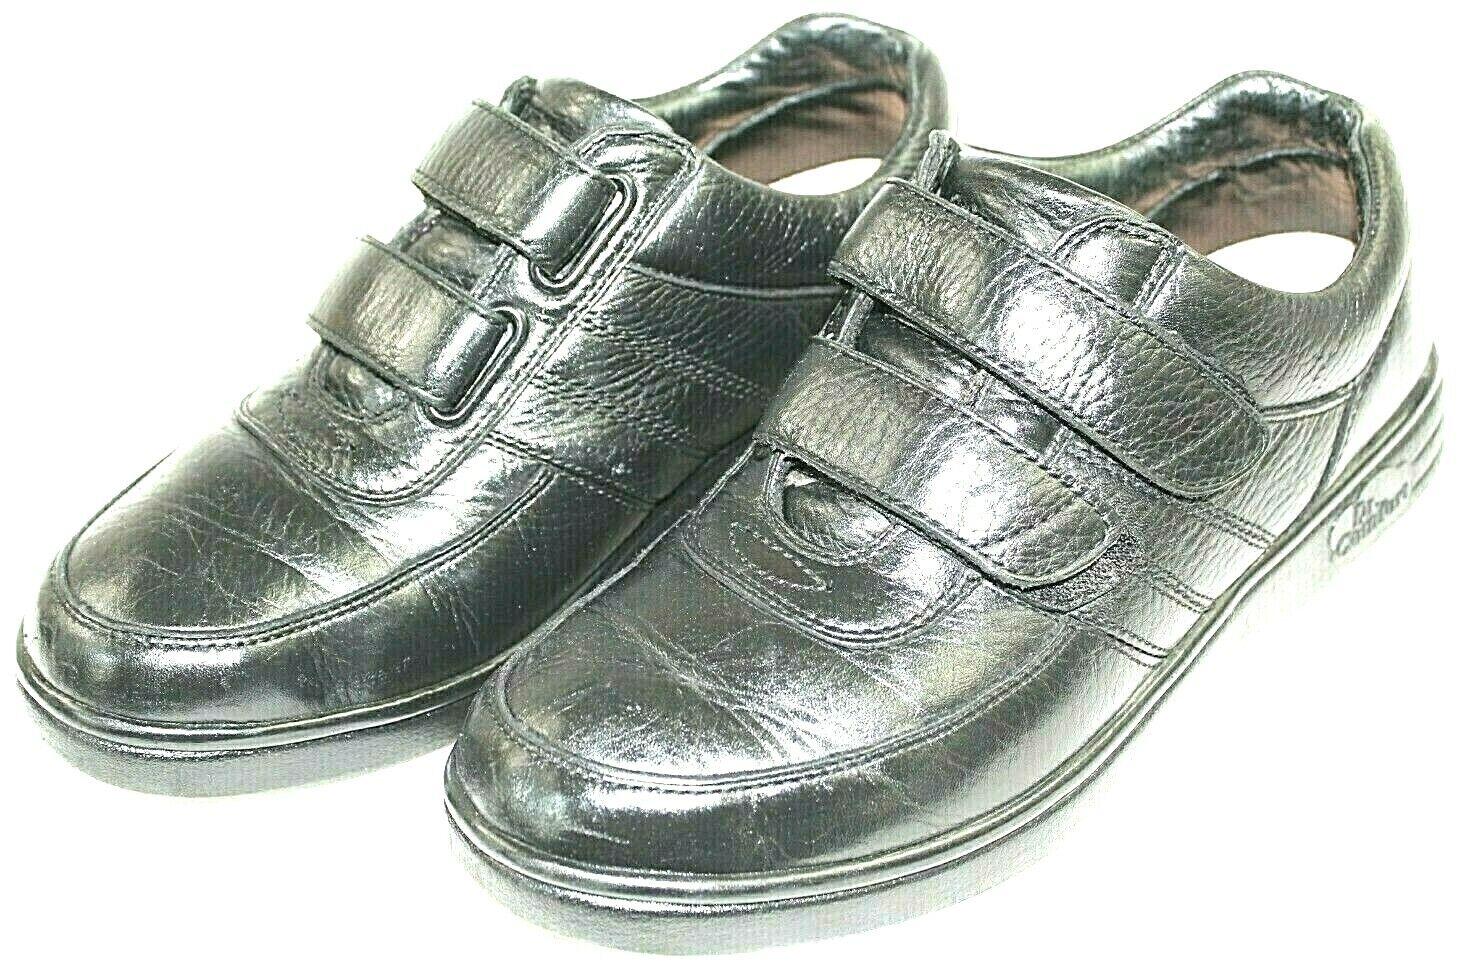 DR. COMFORT womens athletic shoes size 9.5 M leather upper black vel stick strap